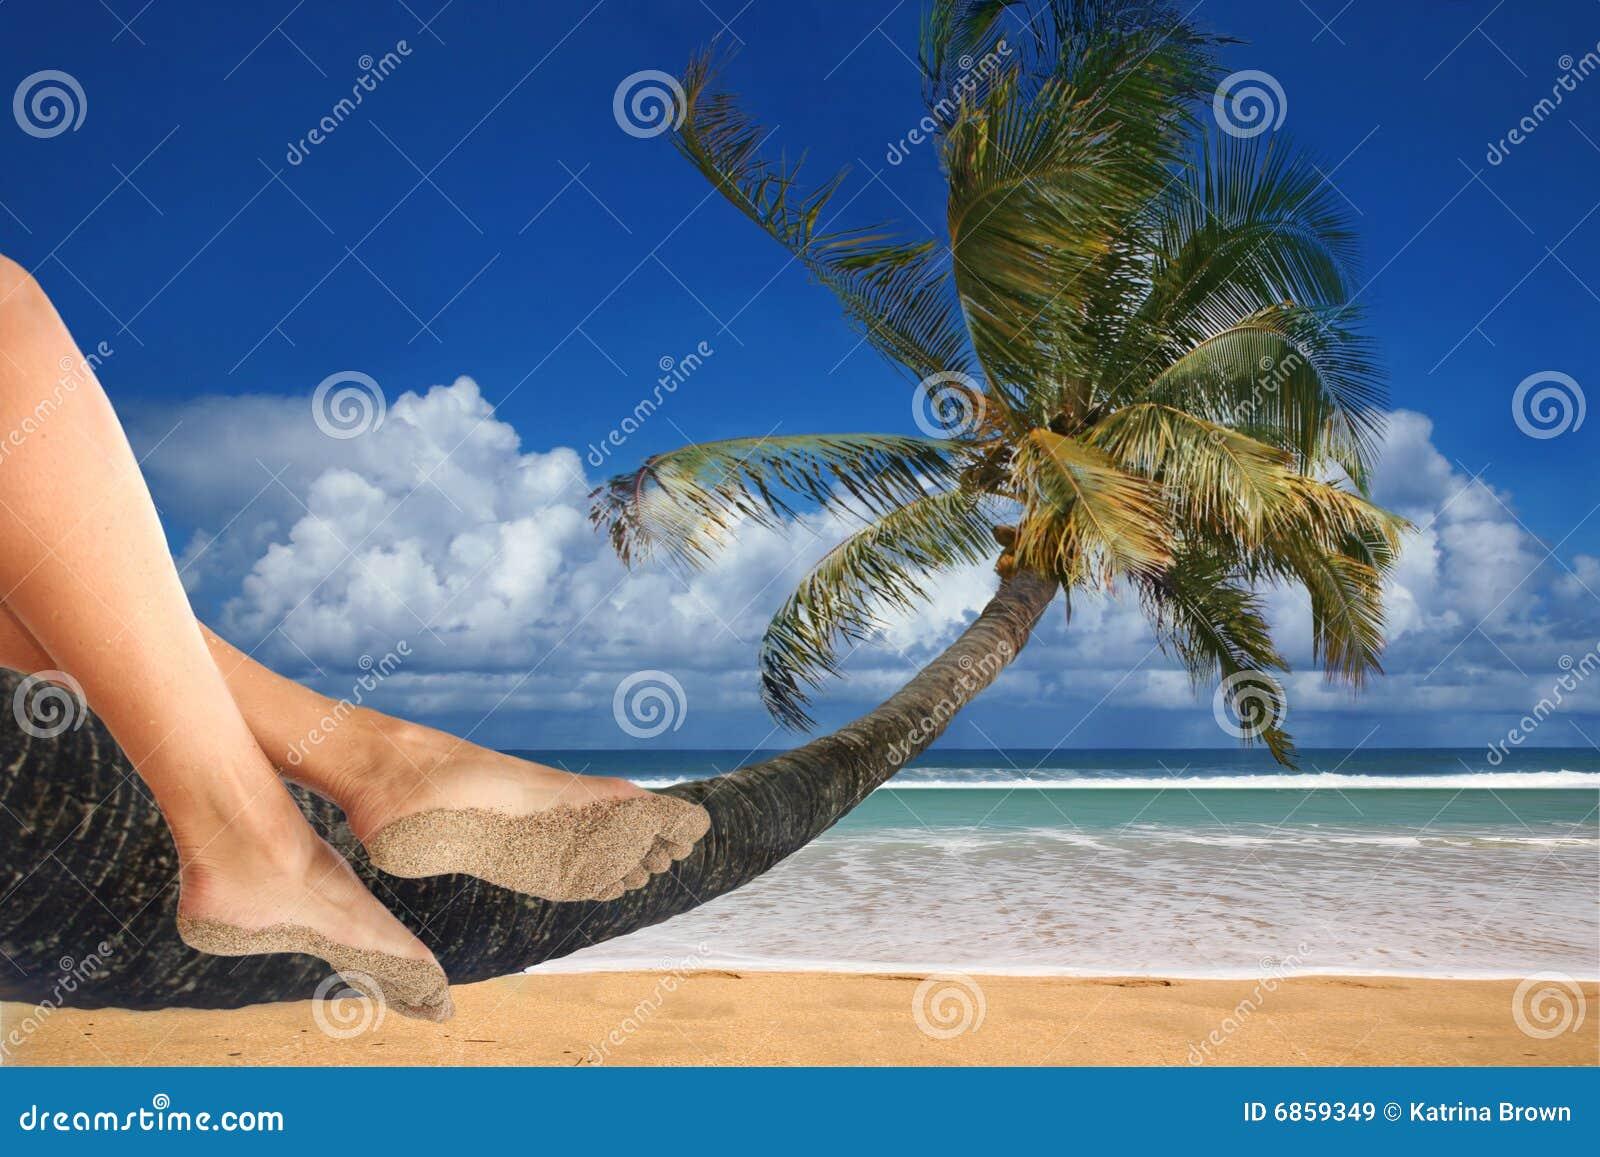 итог релаксации пляжа